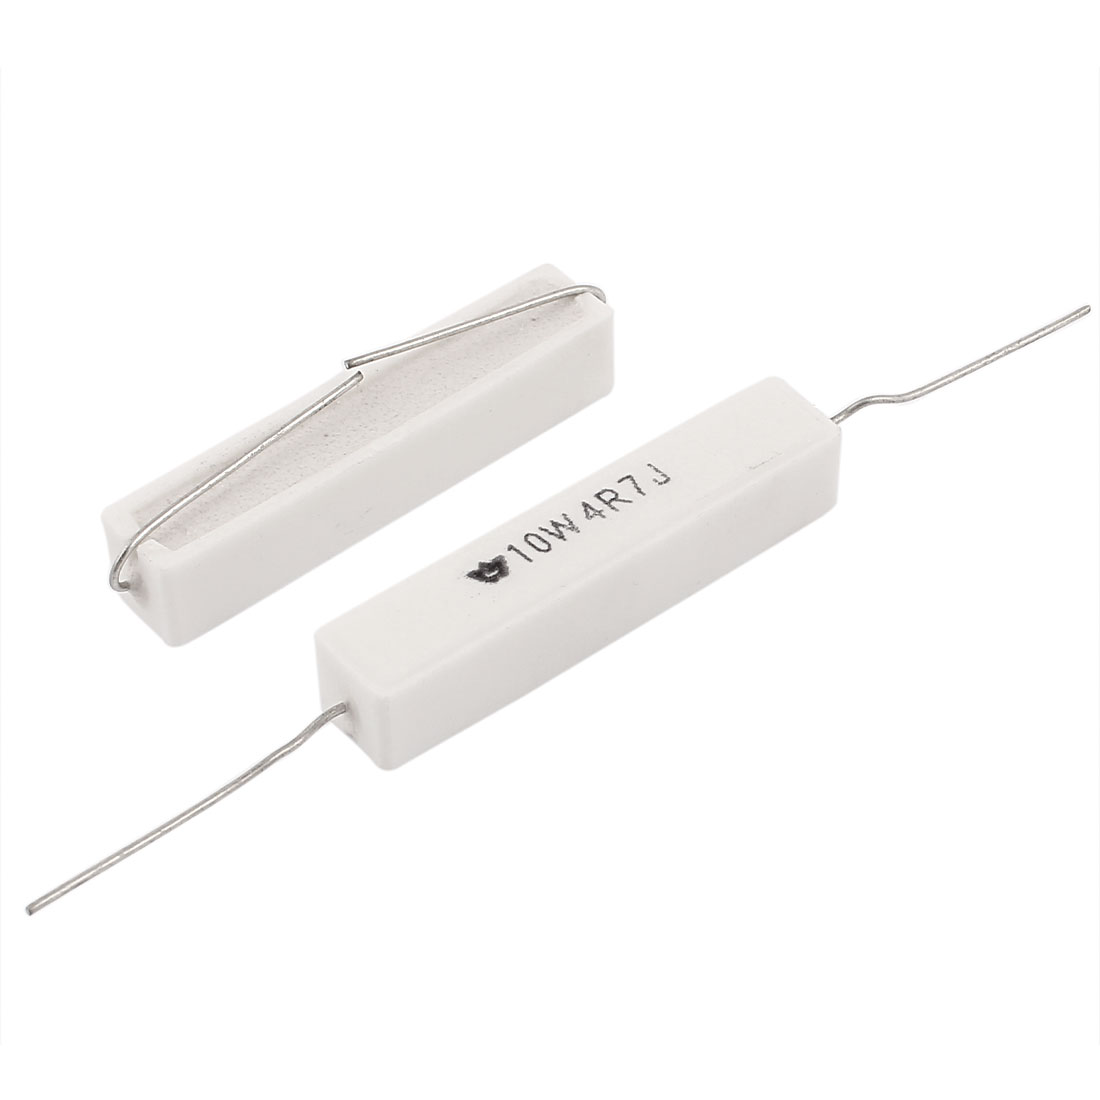 2pcs 10W Watt 4R7J 4.7Ohm 5% Ceramic Cement Power Resistor